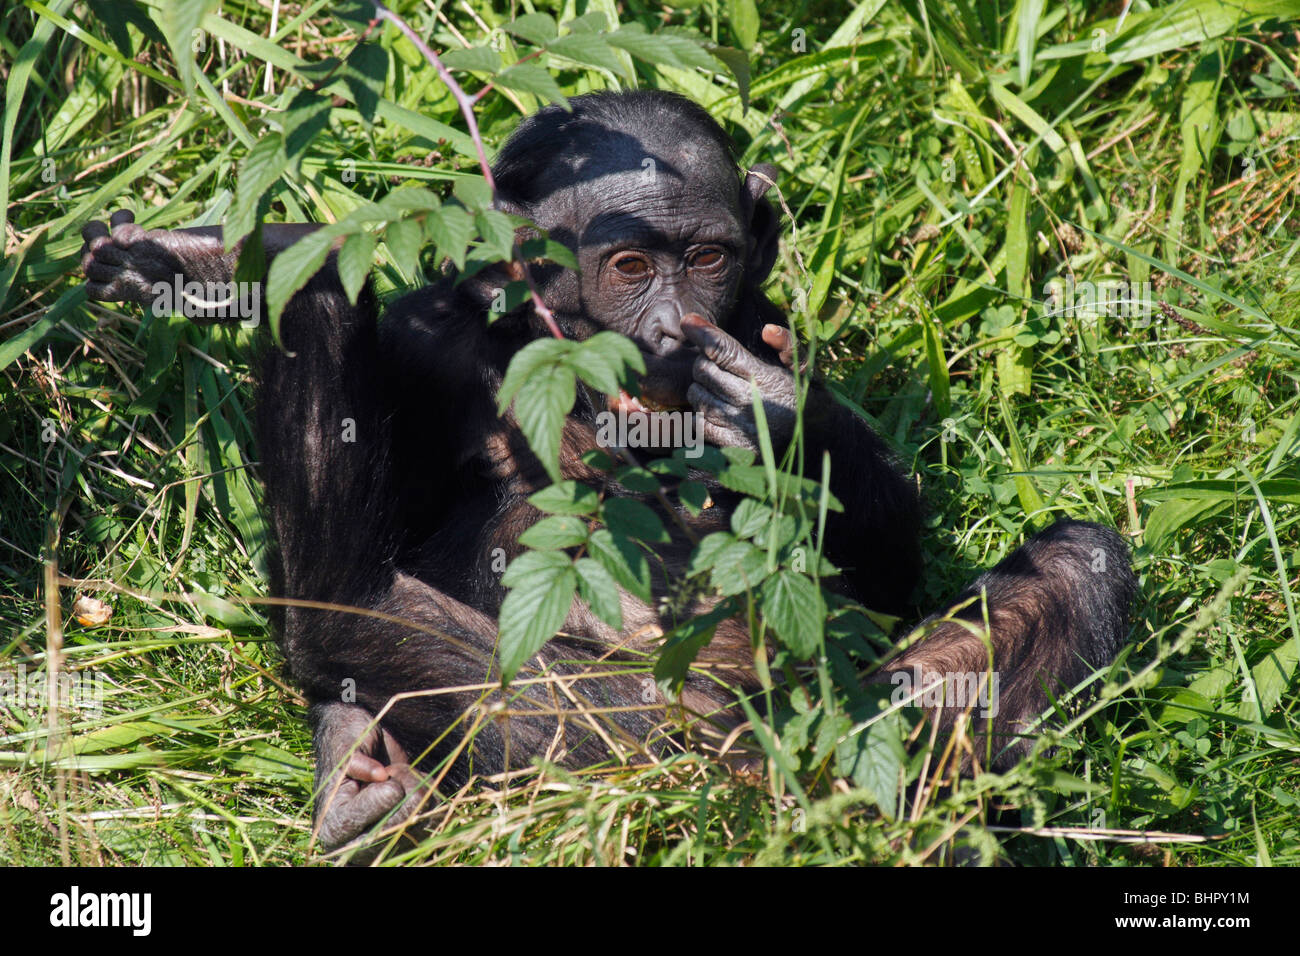 Bonobo Chimpanzee (Pan paniscus), juvenile hiding - Stock Image